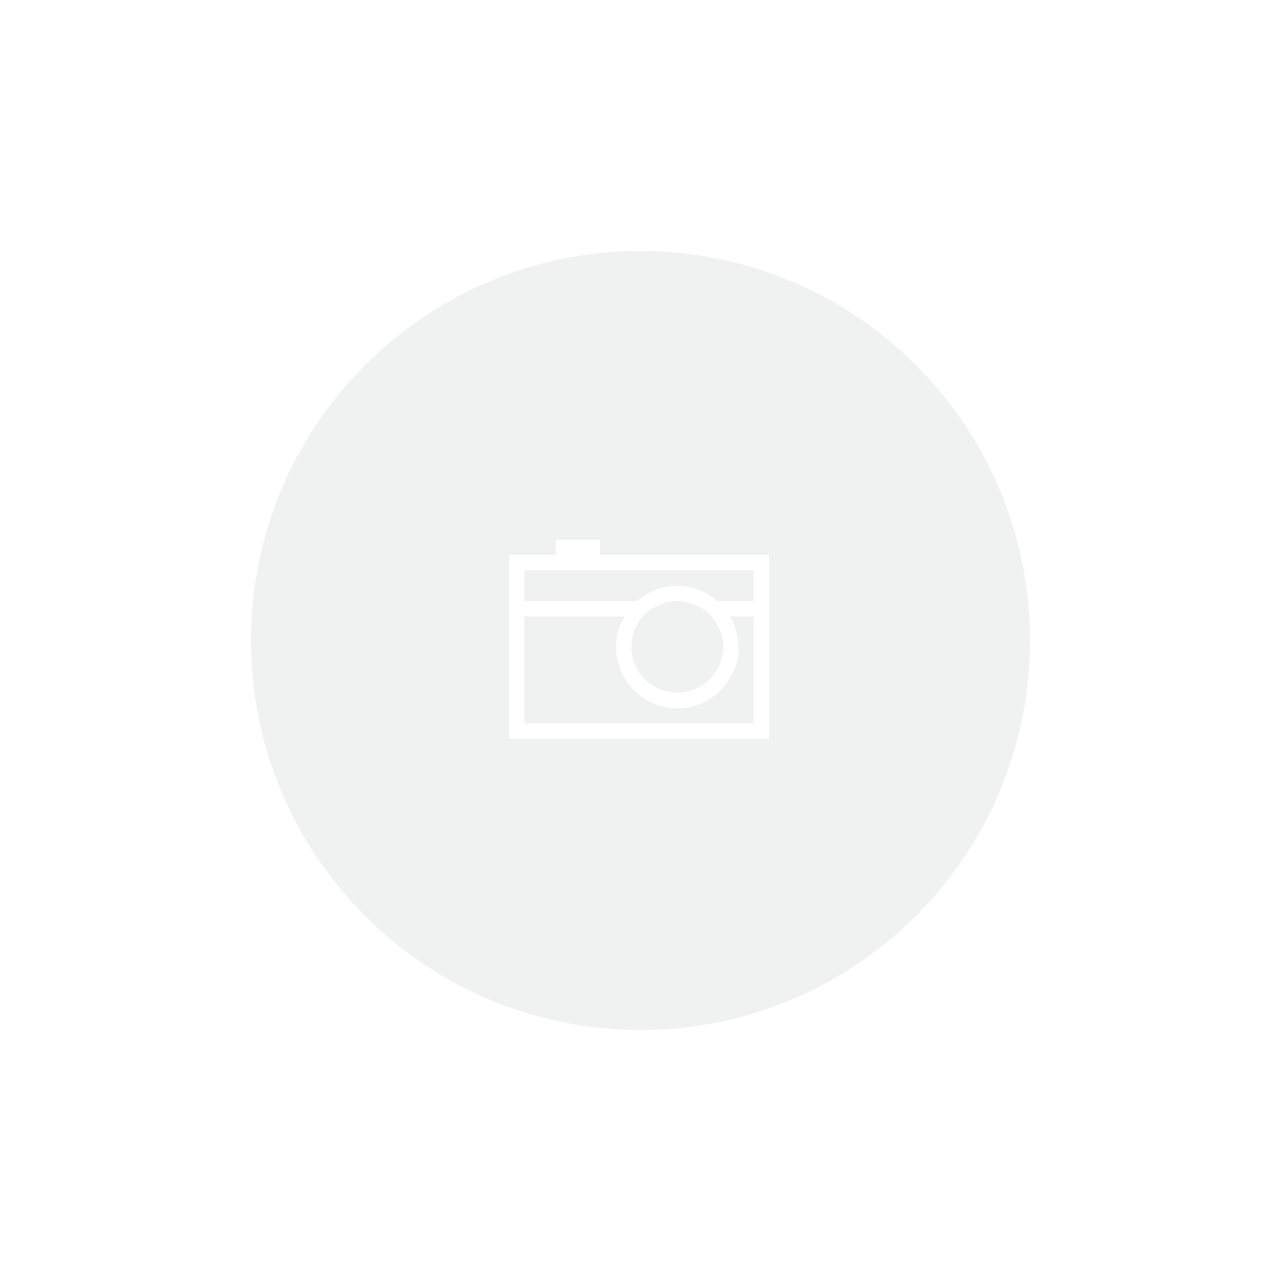 Papel Artesanal Indiano - Ref. 79